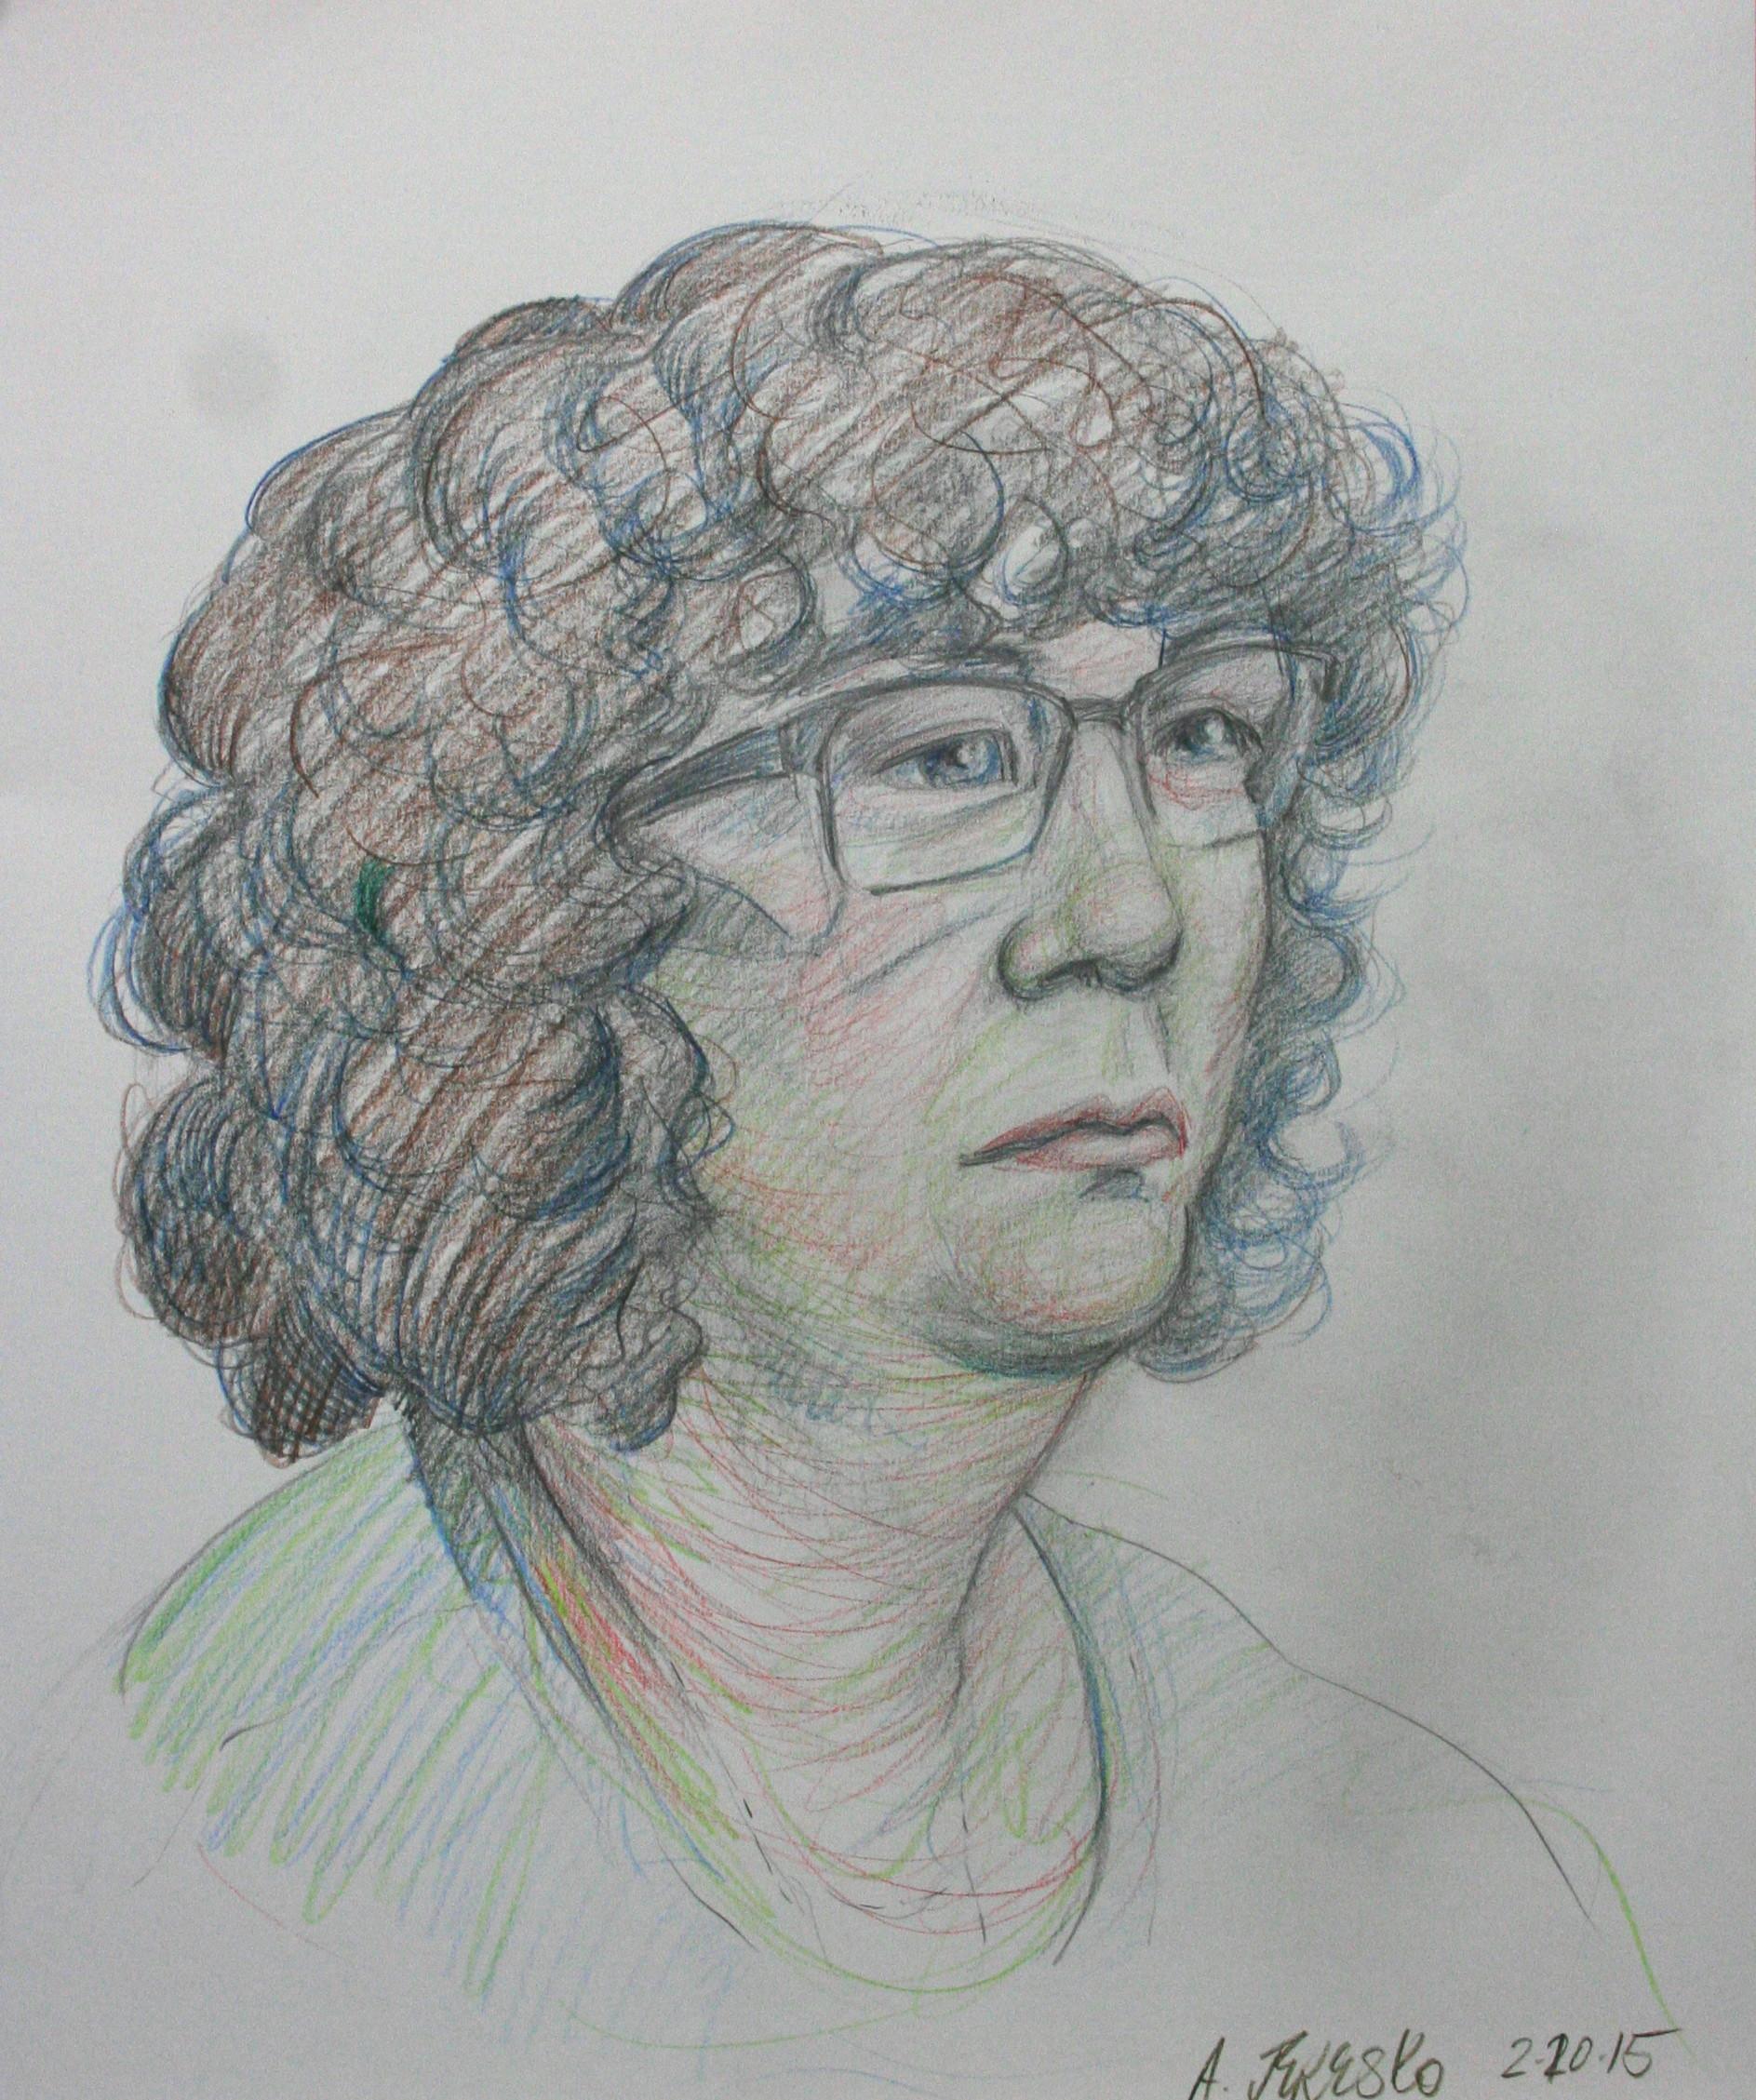 Alice Jeresko did this 3-hour drawing.